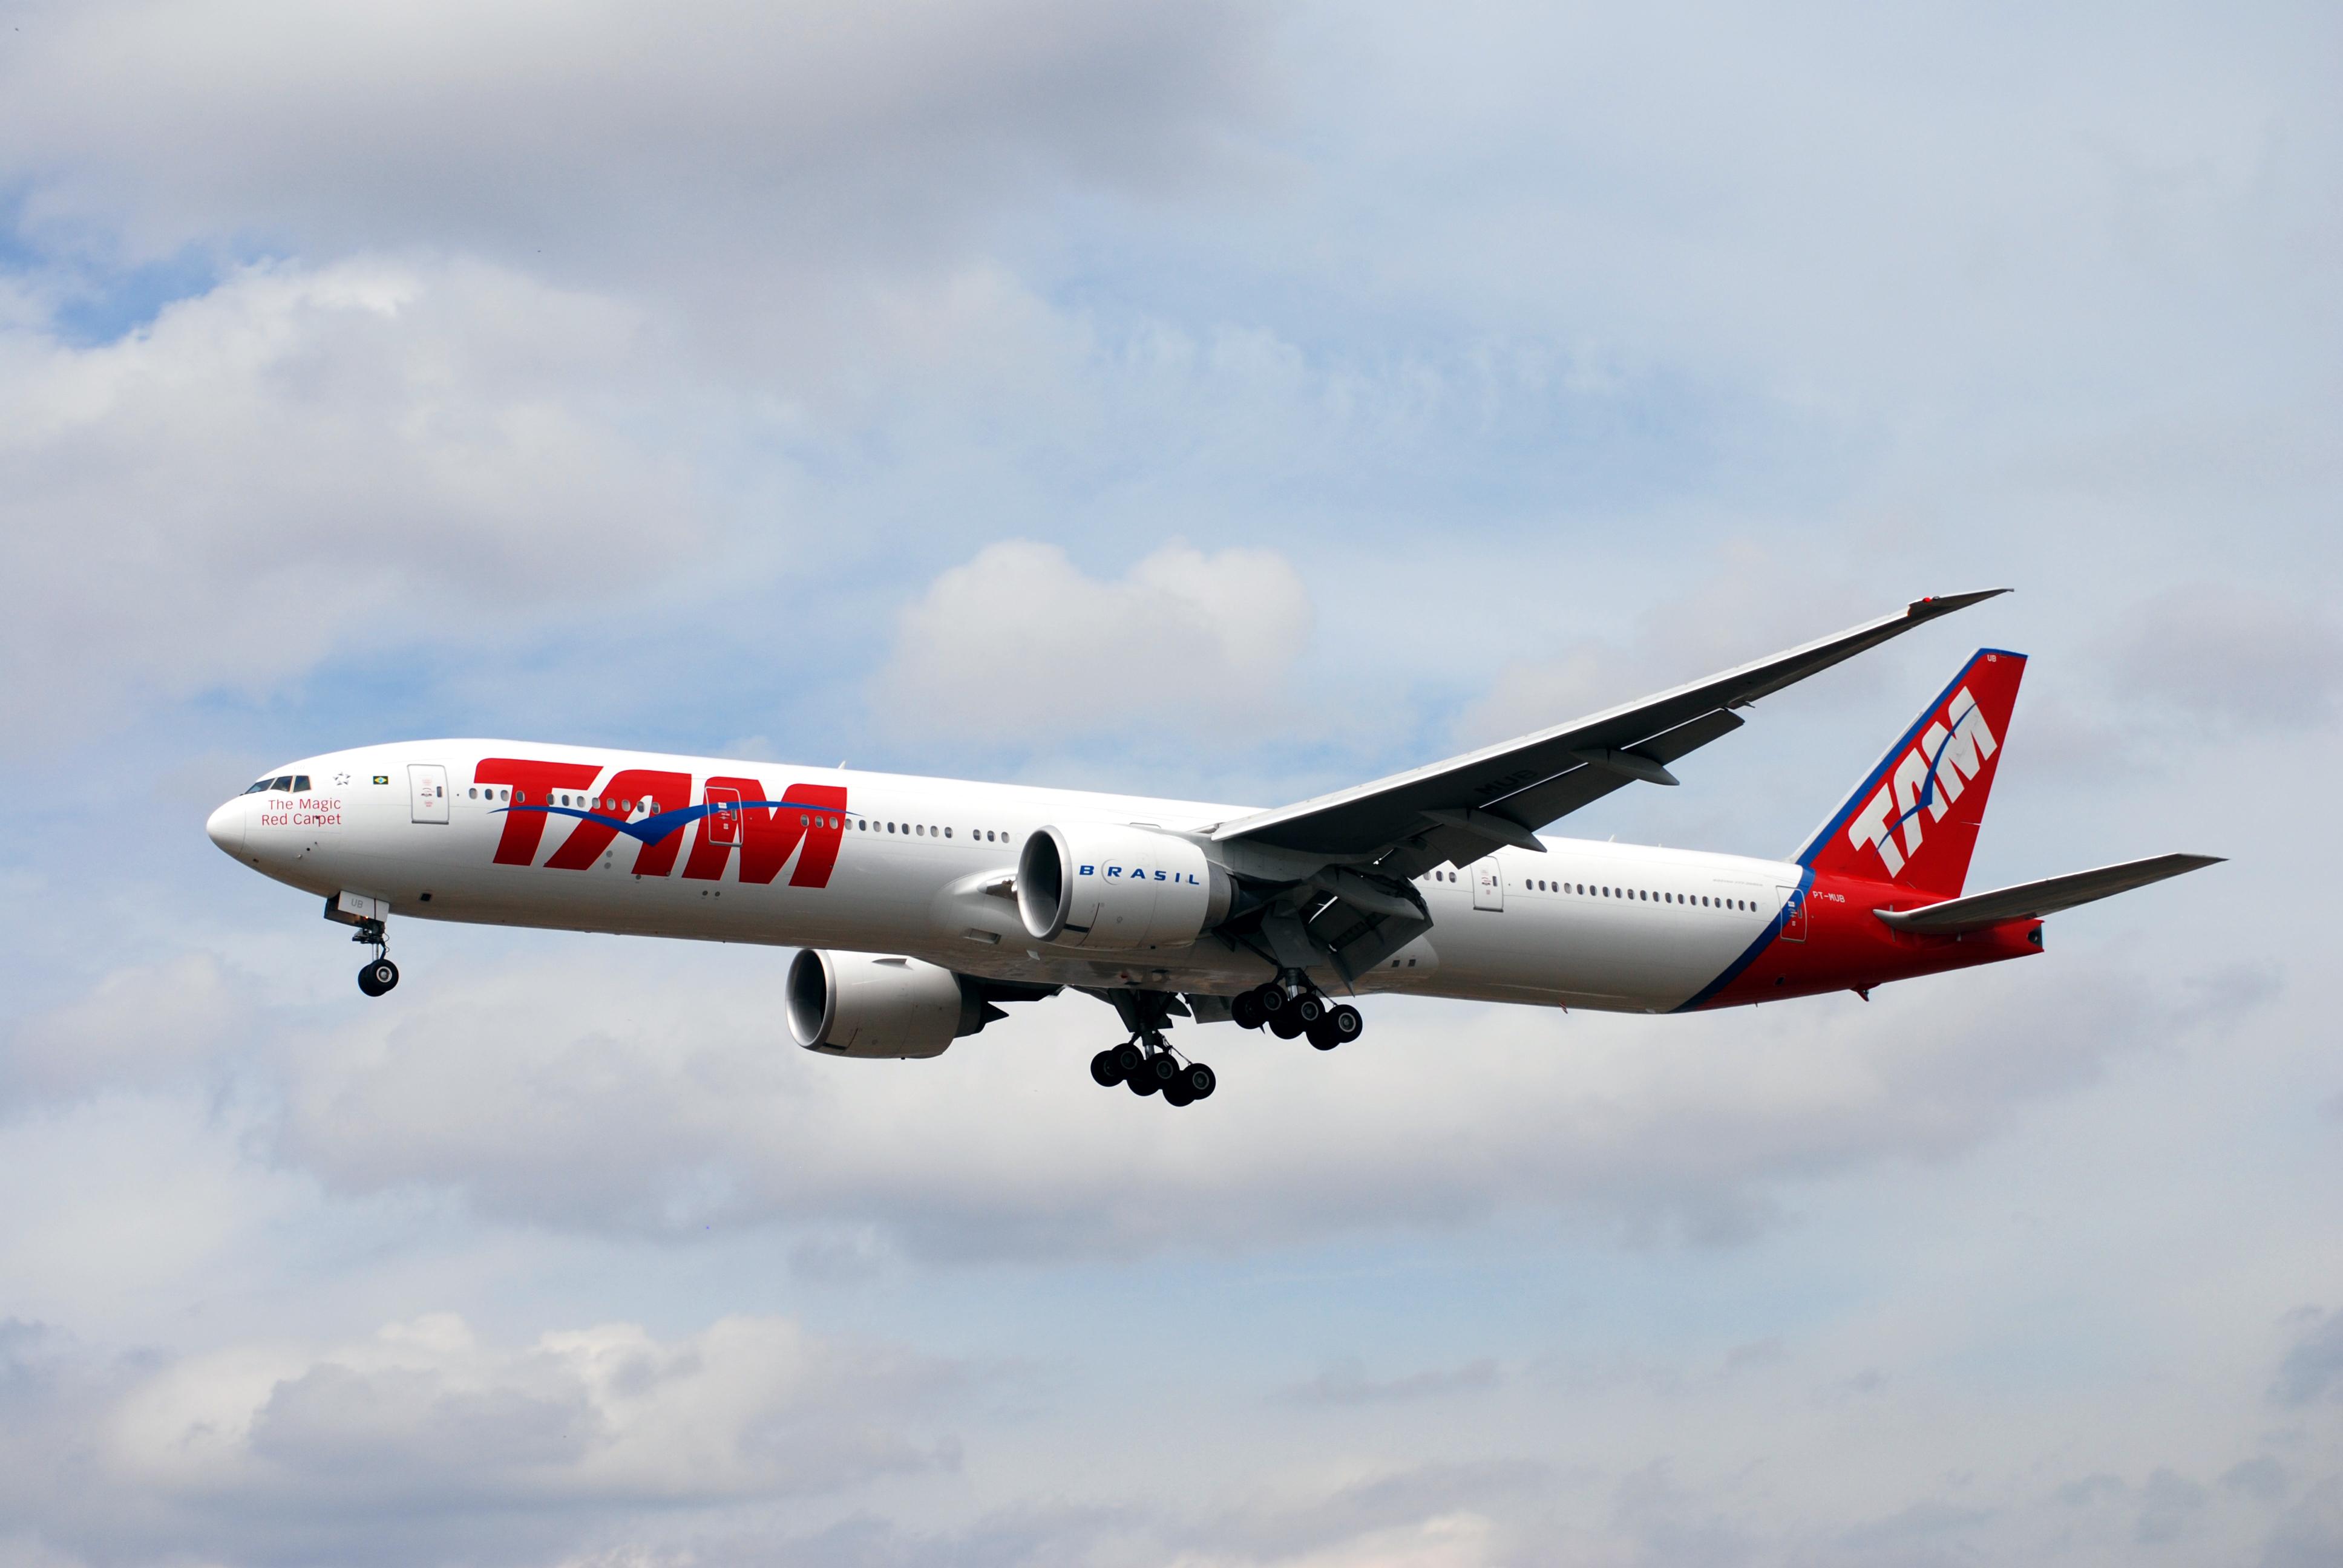 Boeing 7778 van LATAM in oude livery (Bron: WikiMedia Commons / Allen Watkin)